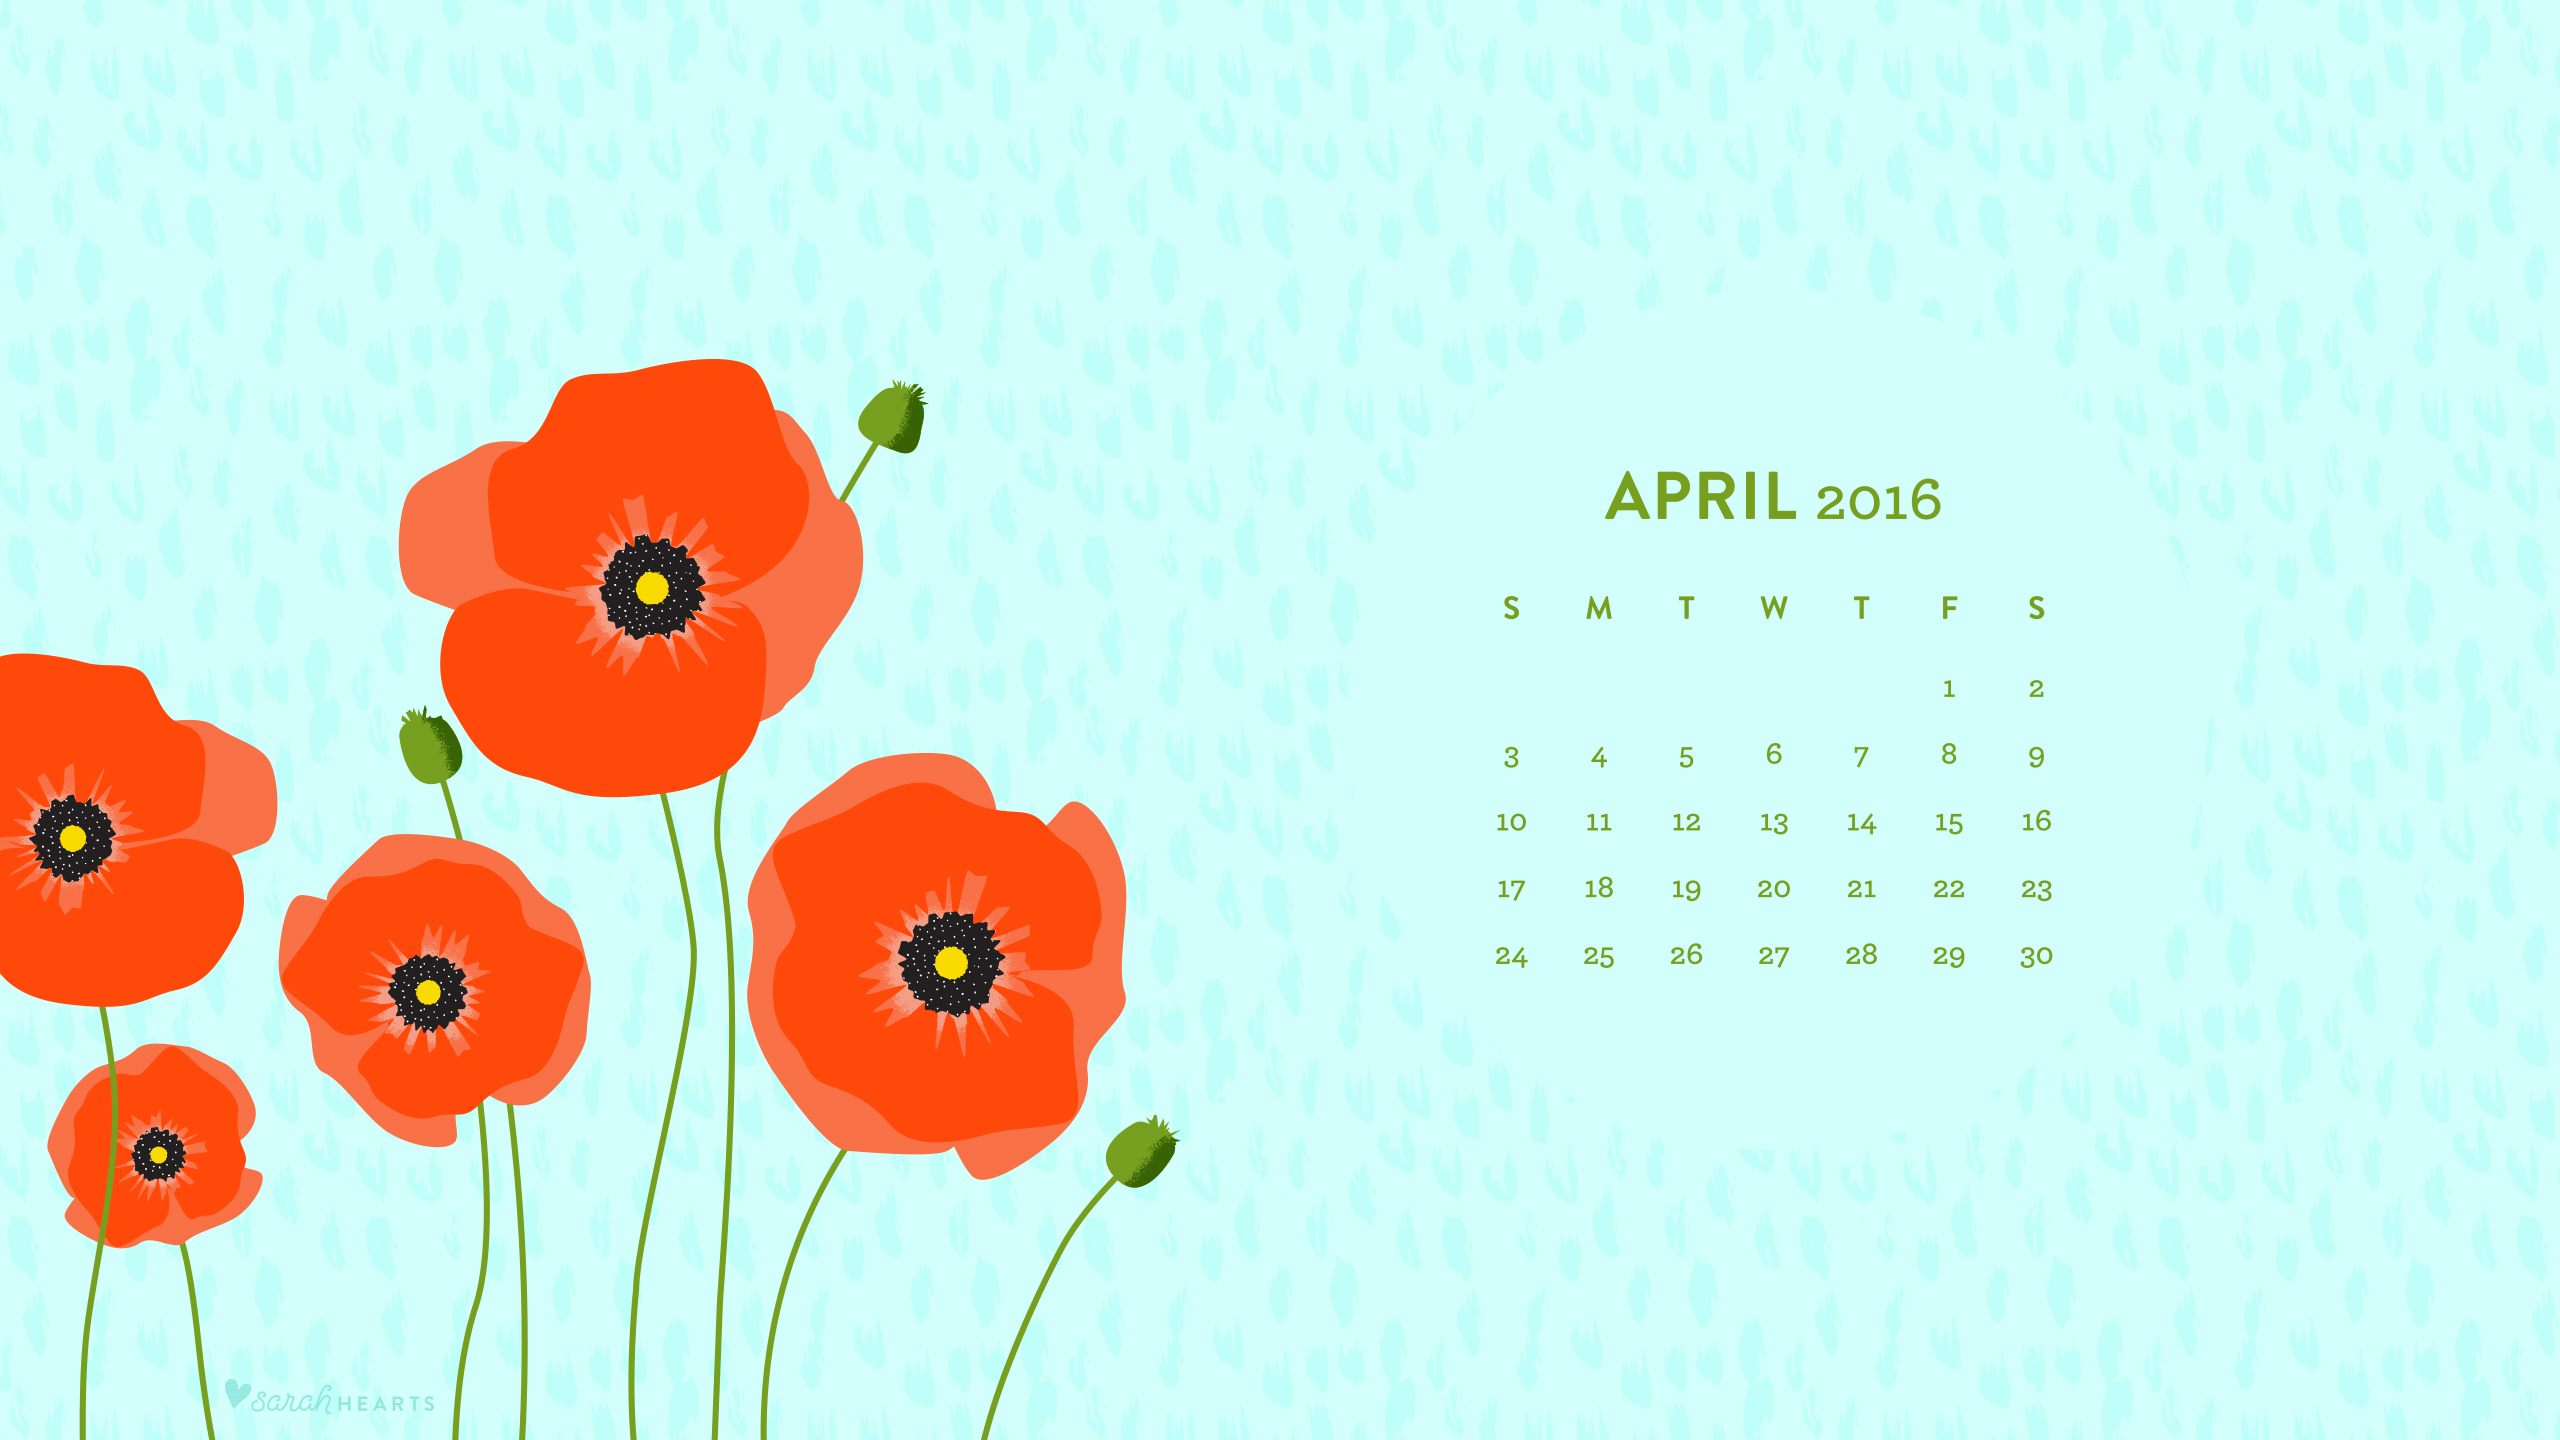 April 2016 Poppy Calendar Wallpaper   Sarah Hearts 2560x1440